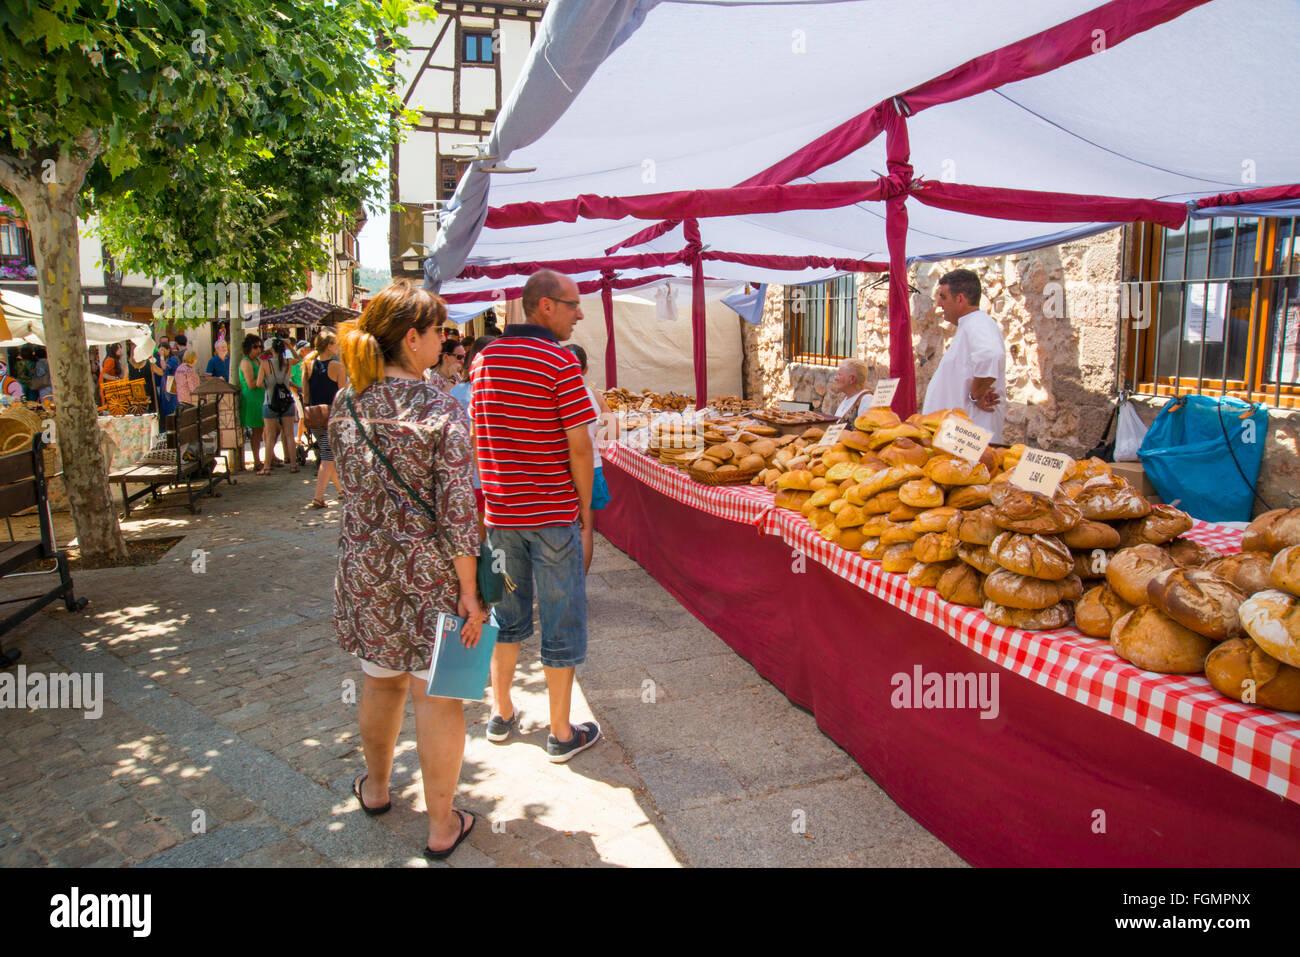 Flea market. Covarrubias, Burgos province, Castilla Leon, Spain. - Stock Image